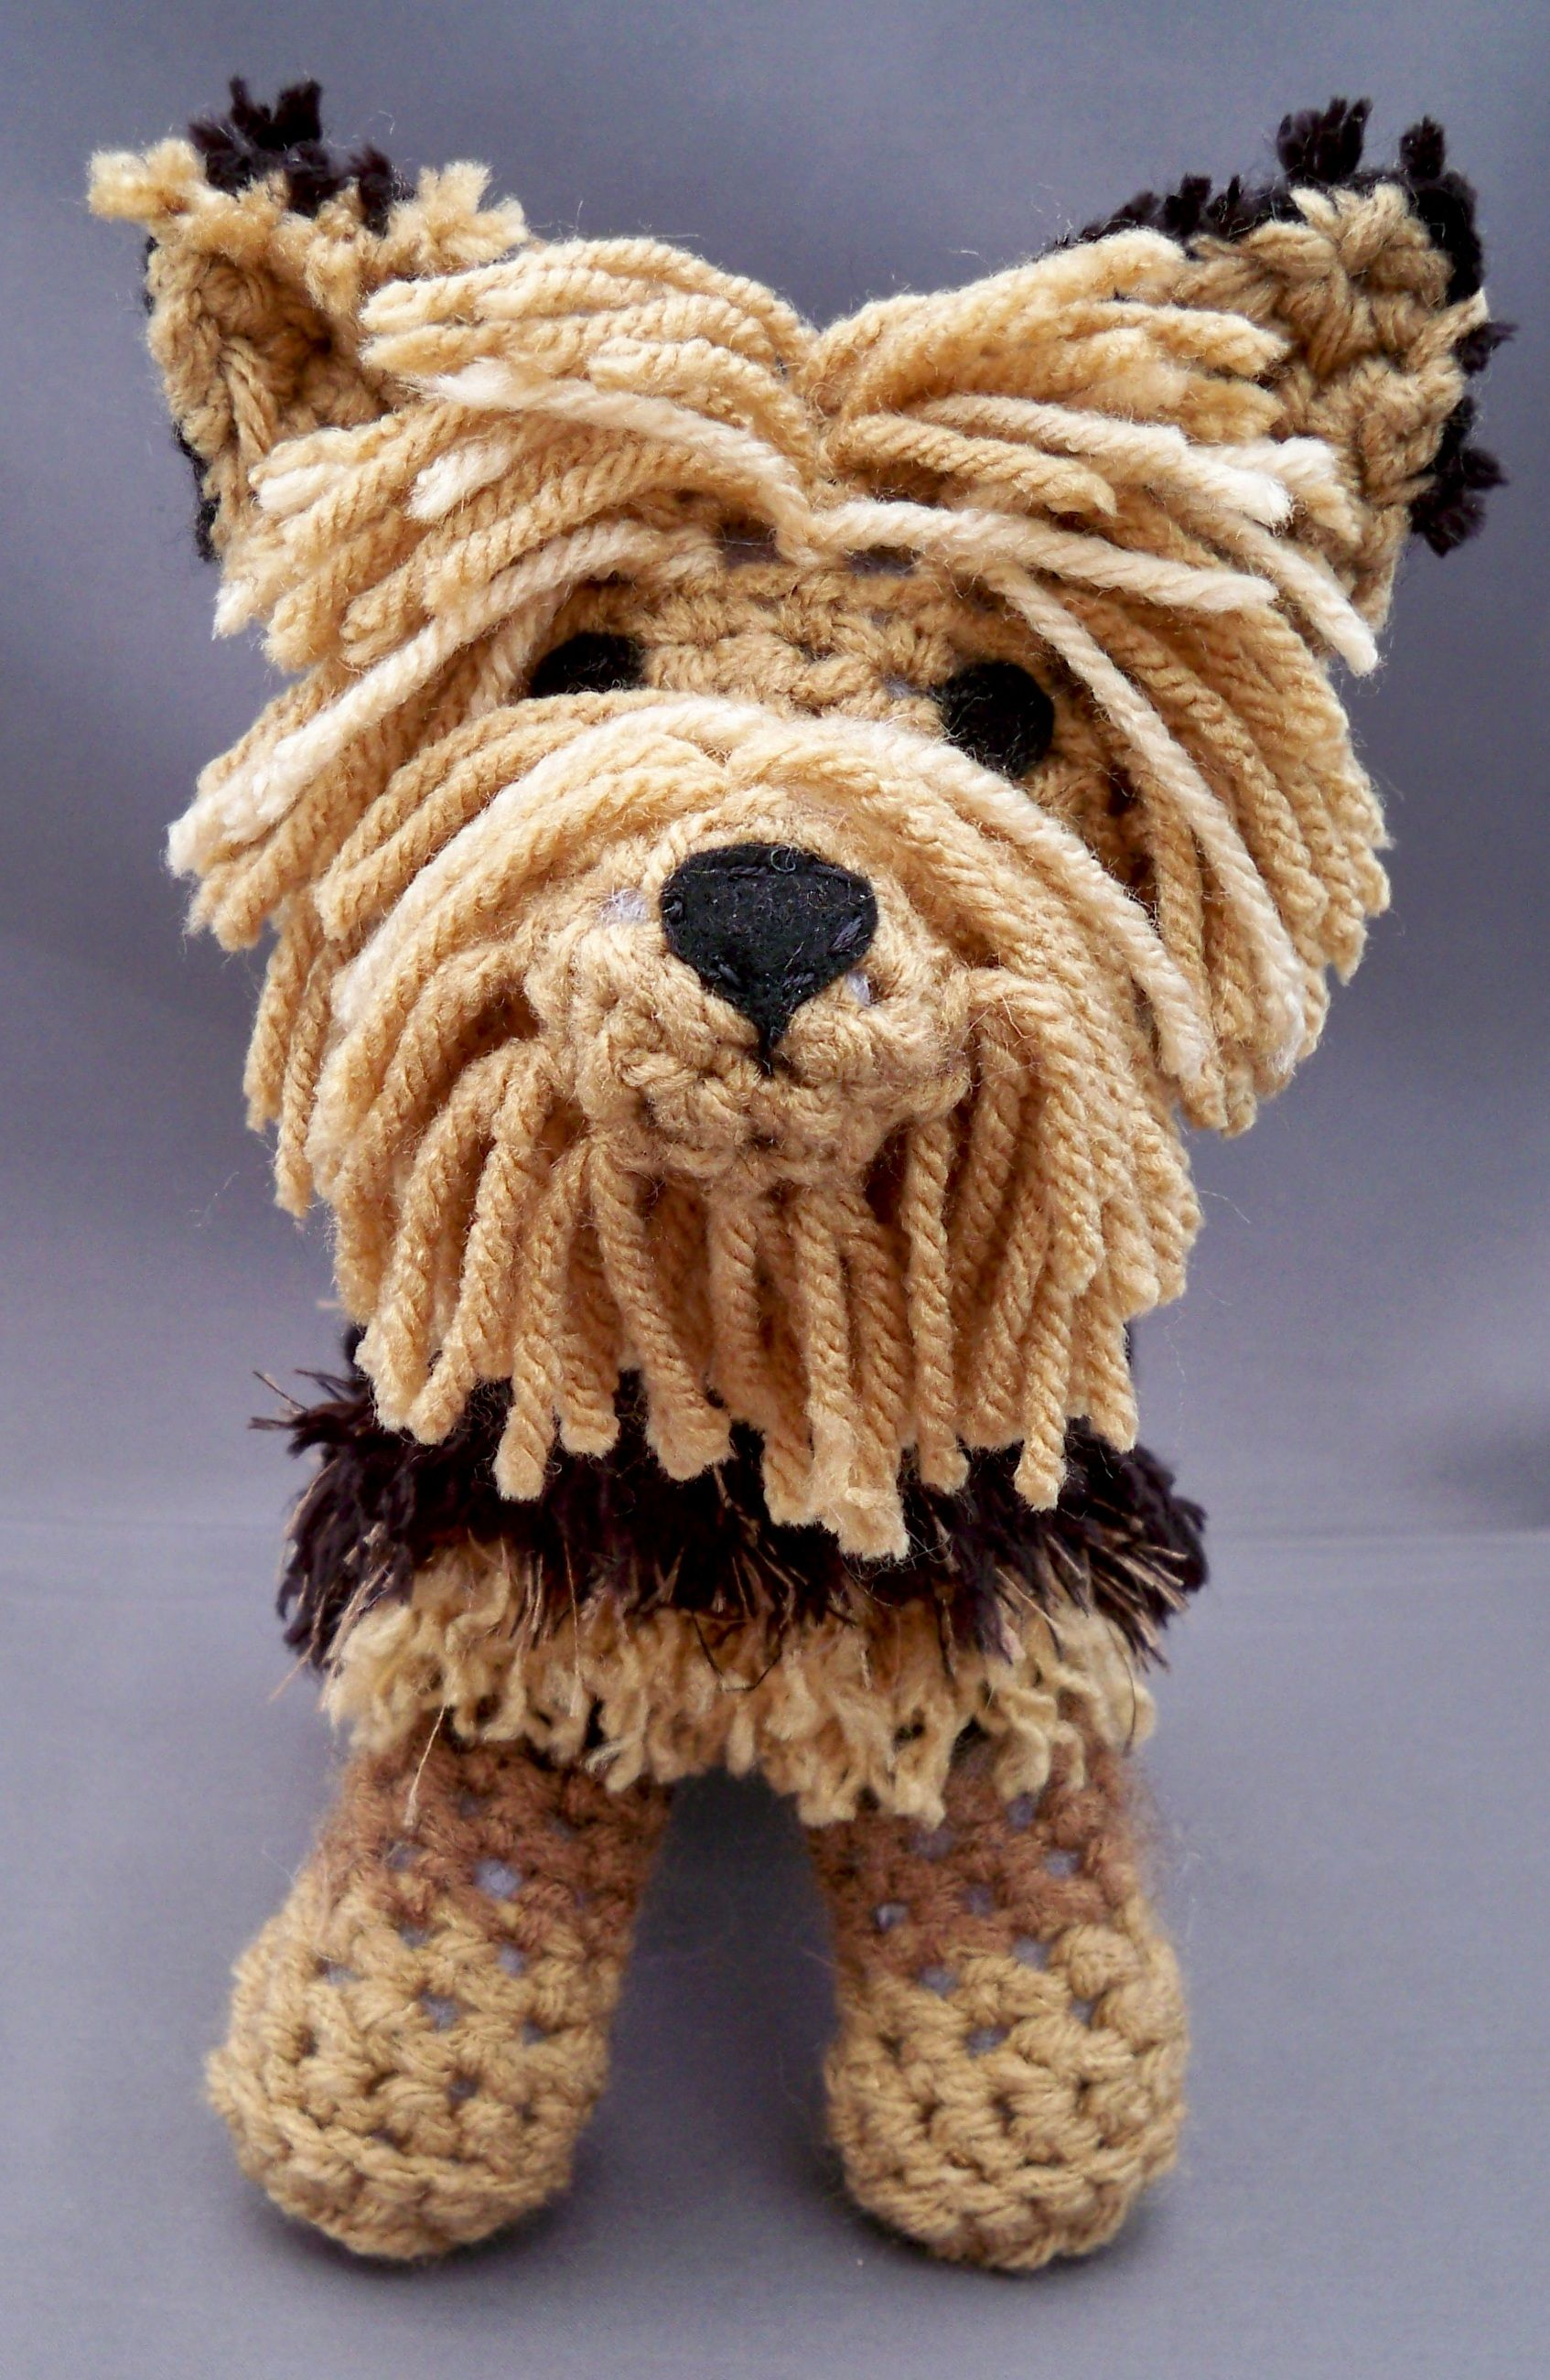 Free Crochet Yorkie Dog Pattern With Video | Perro amigurumi ... | 2601x1694